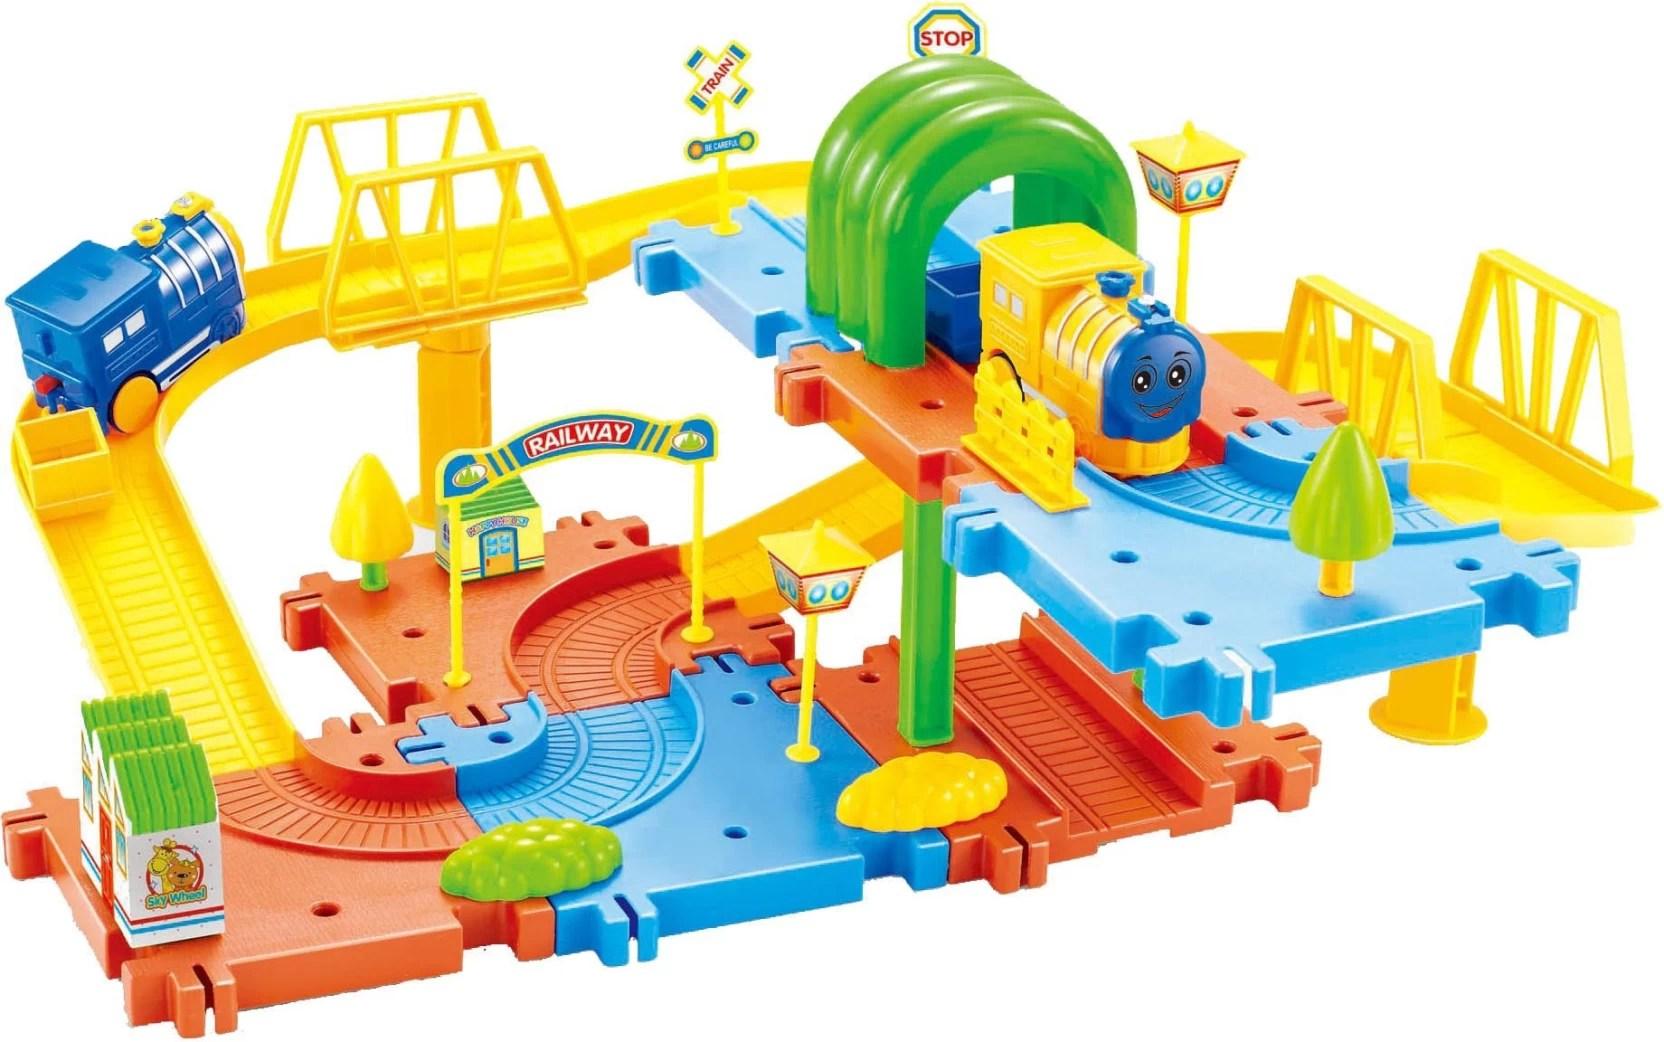 Compelling Upper Lower Level Original Imaehzr5xqdkqvyz Toy Train Sets India Toy Train Sets Canada Saffire Classic Toy Train Set 15 baby Toy Train Sets